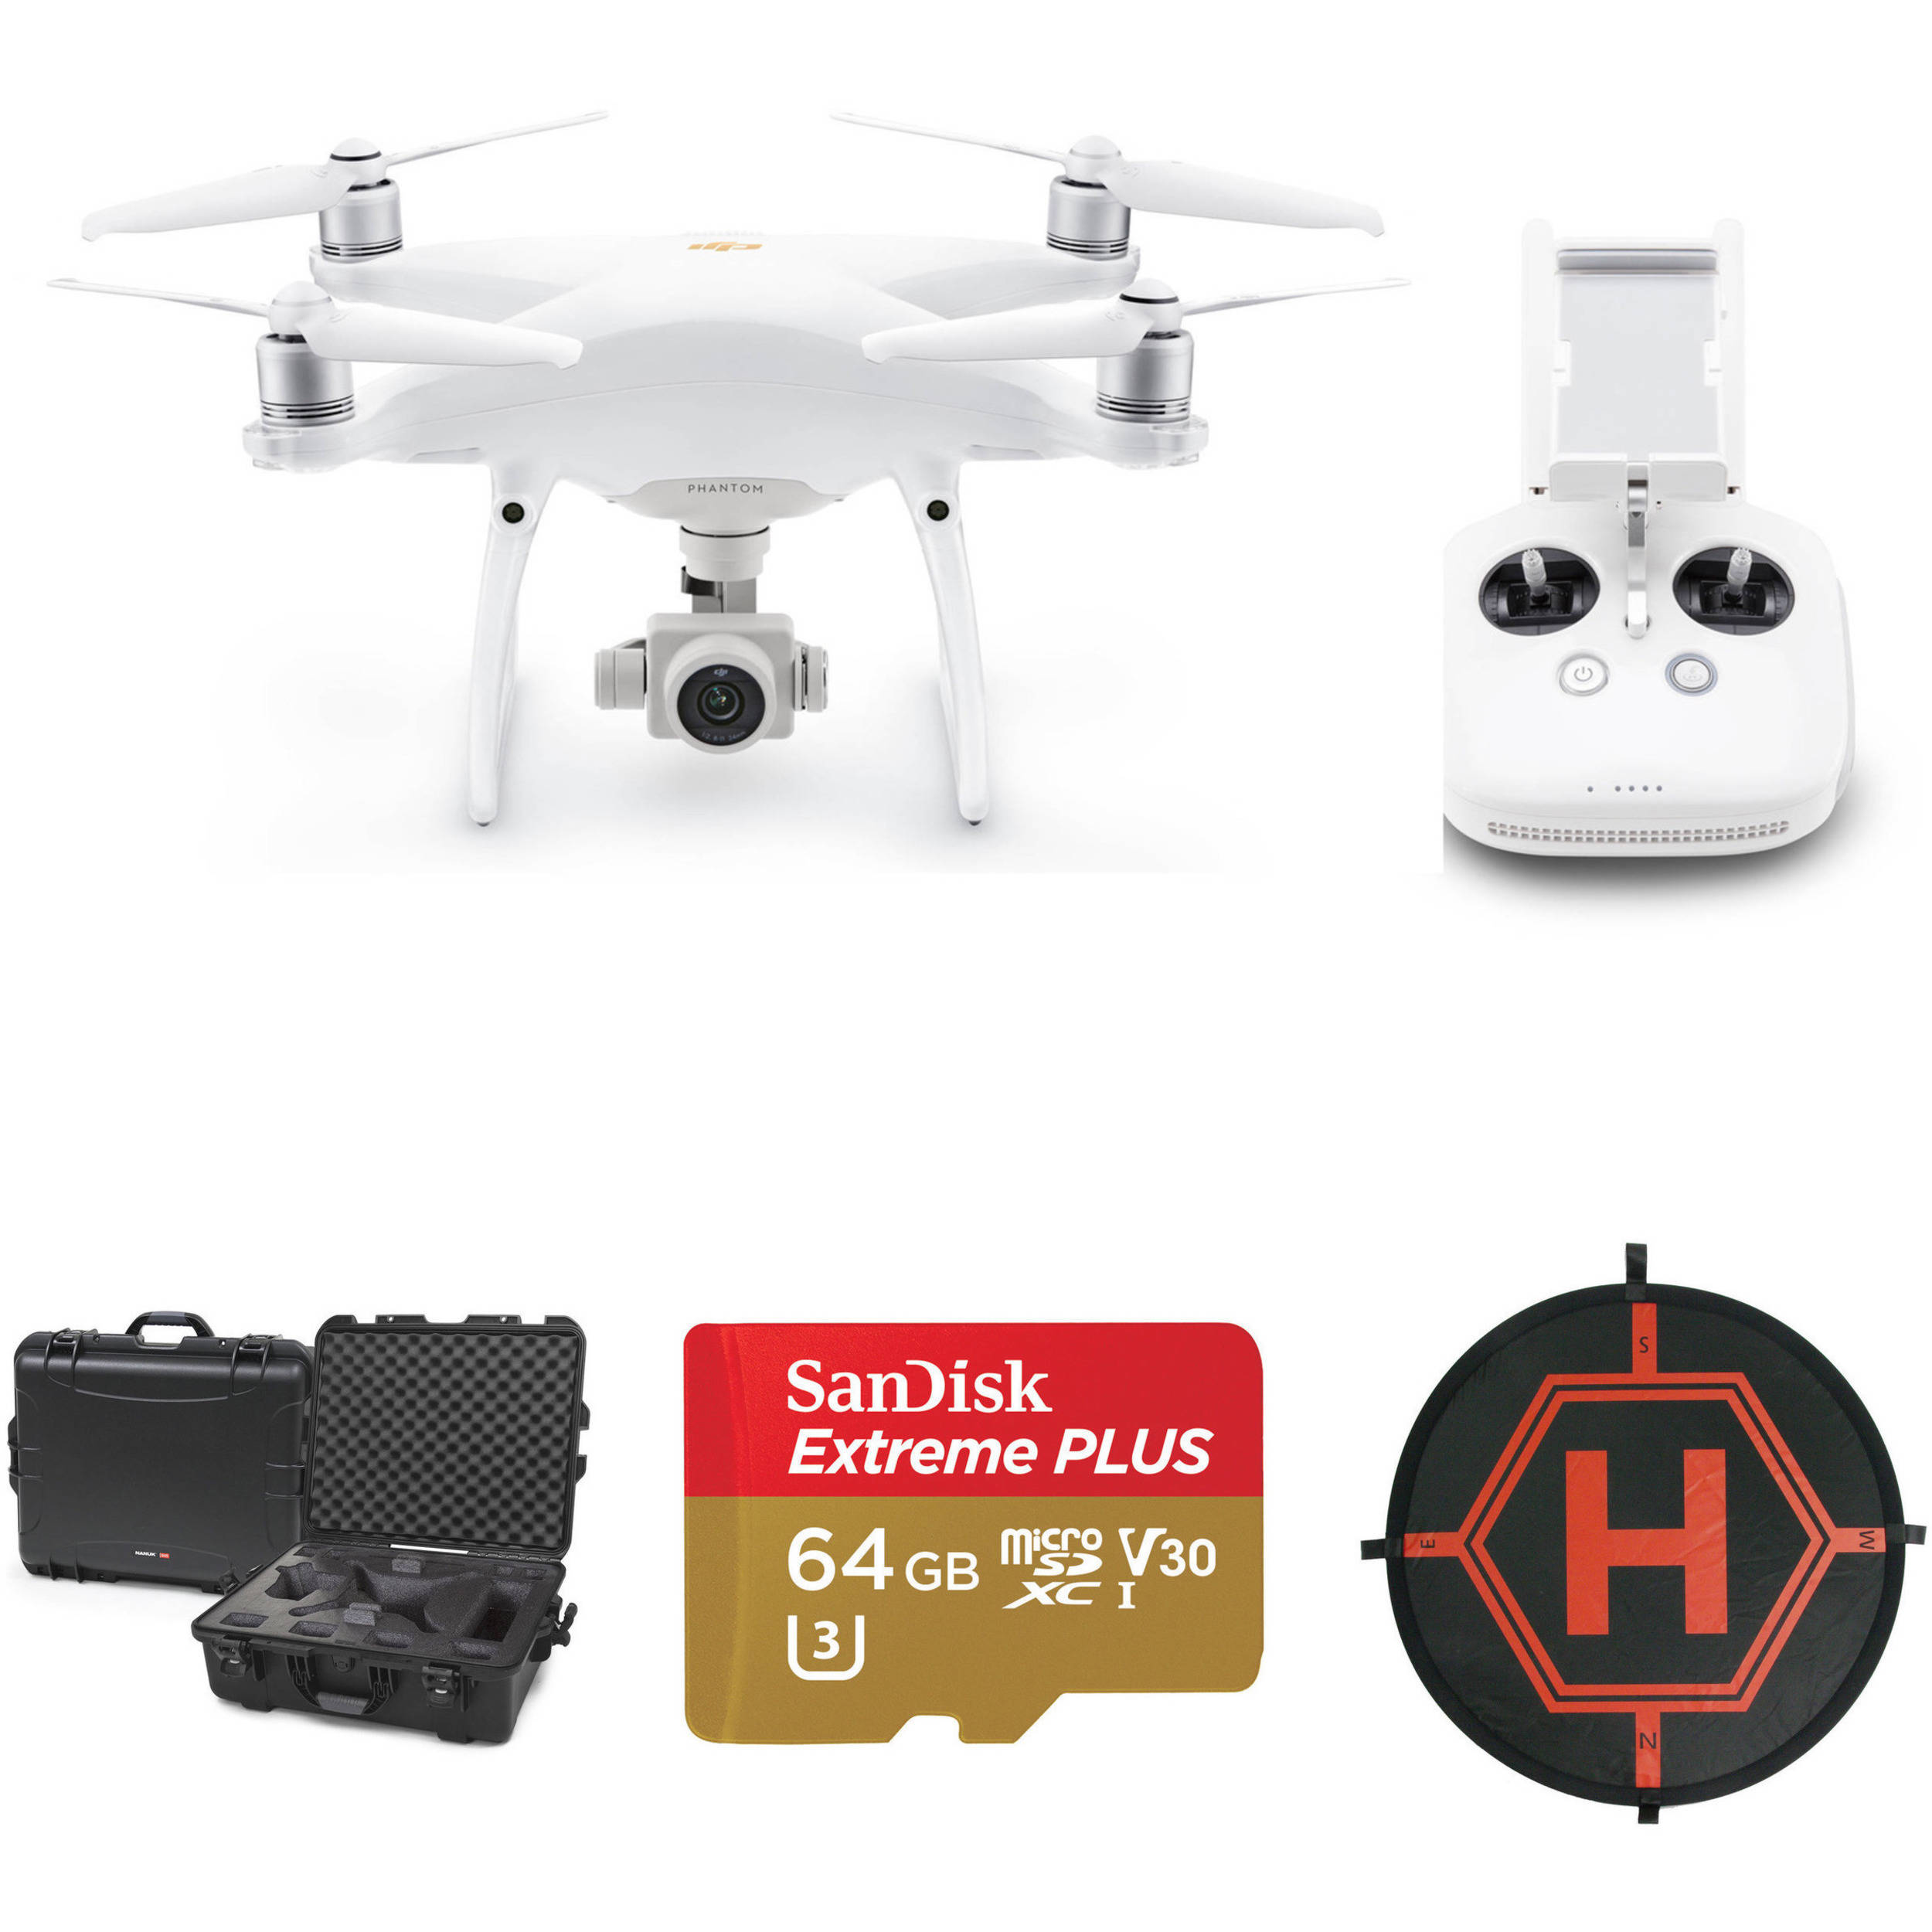 DJI Phantom 4 Pro v2.0 Drone with Hard Case/64GB microSD ...